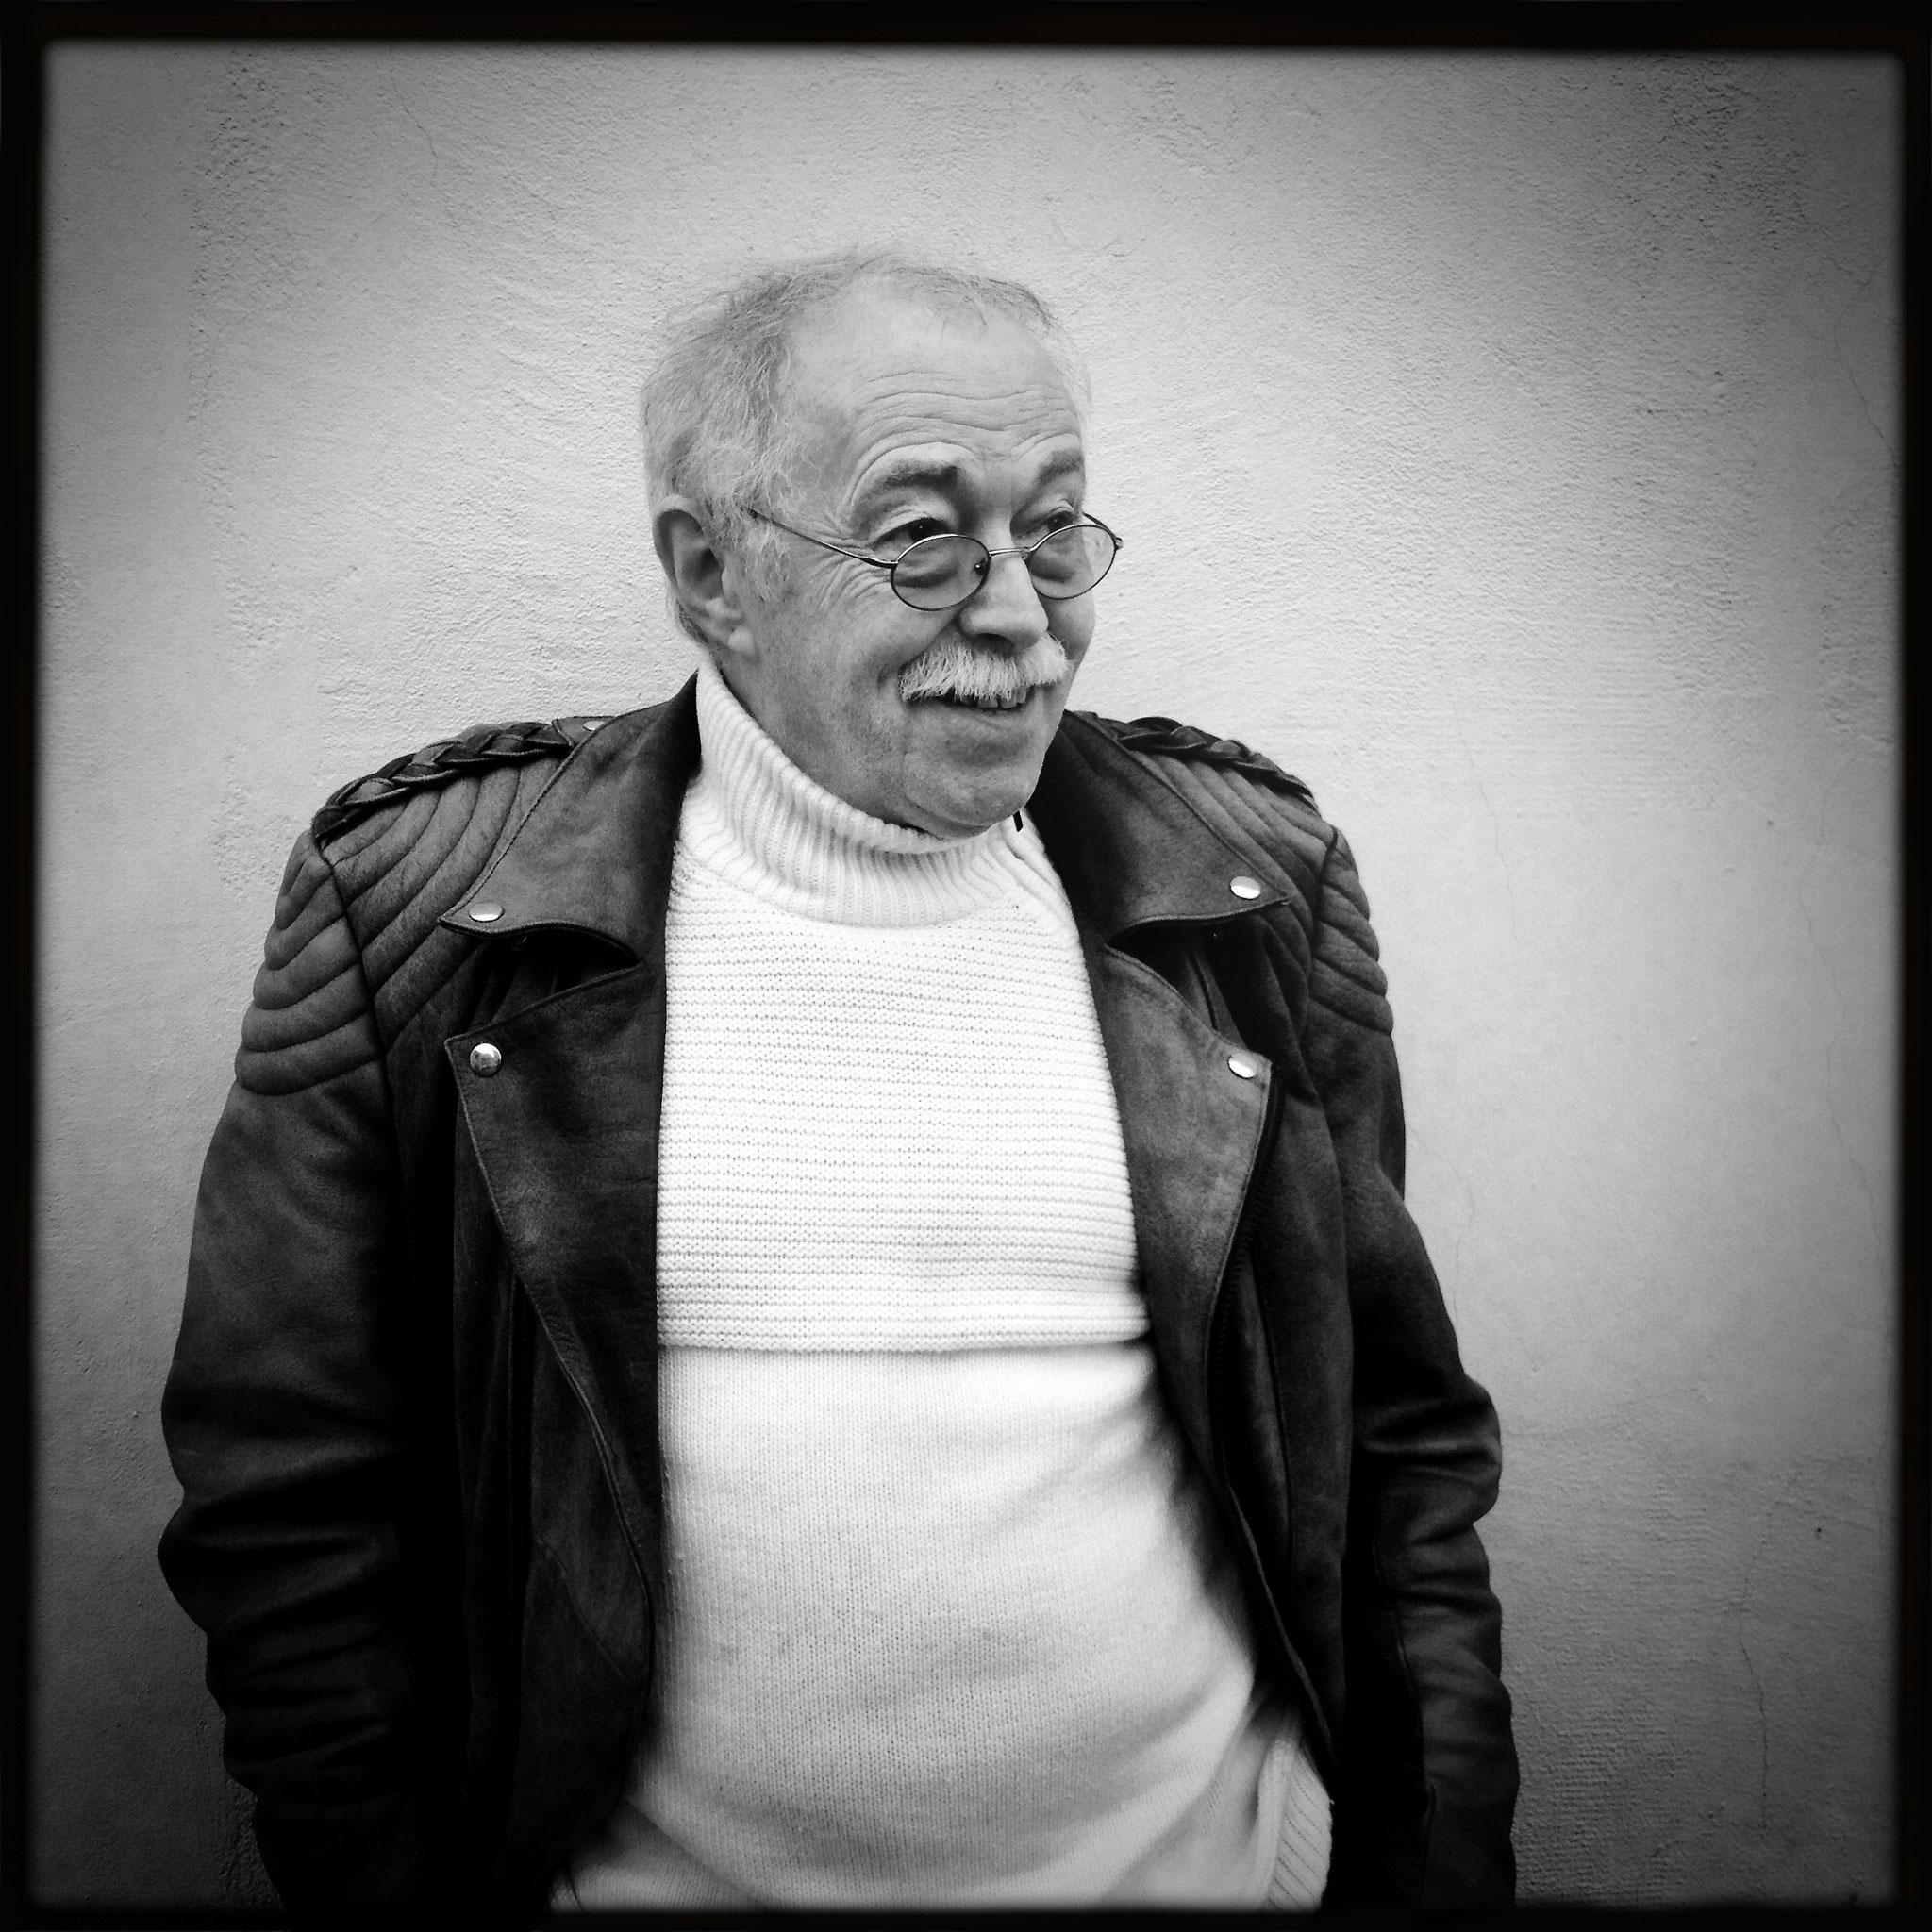 luke haas, musician & comic expert (+)